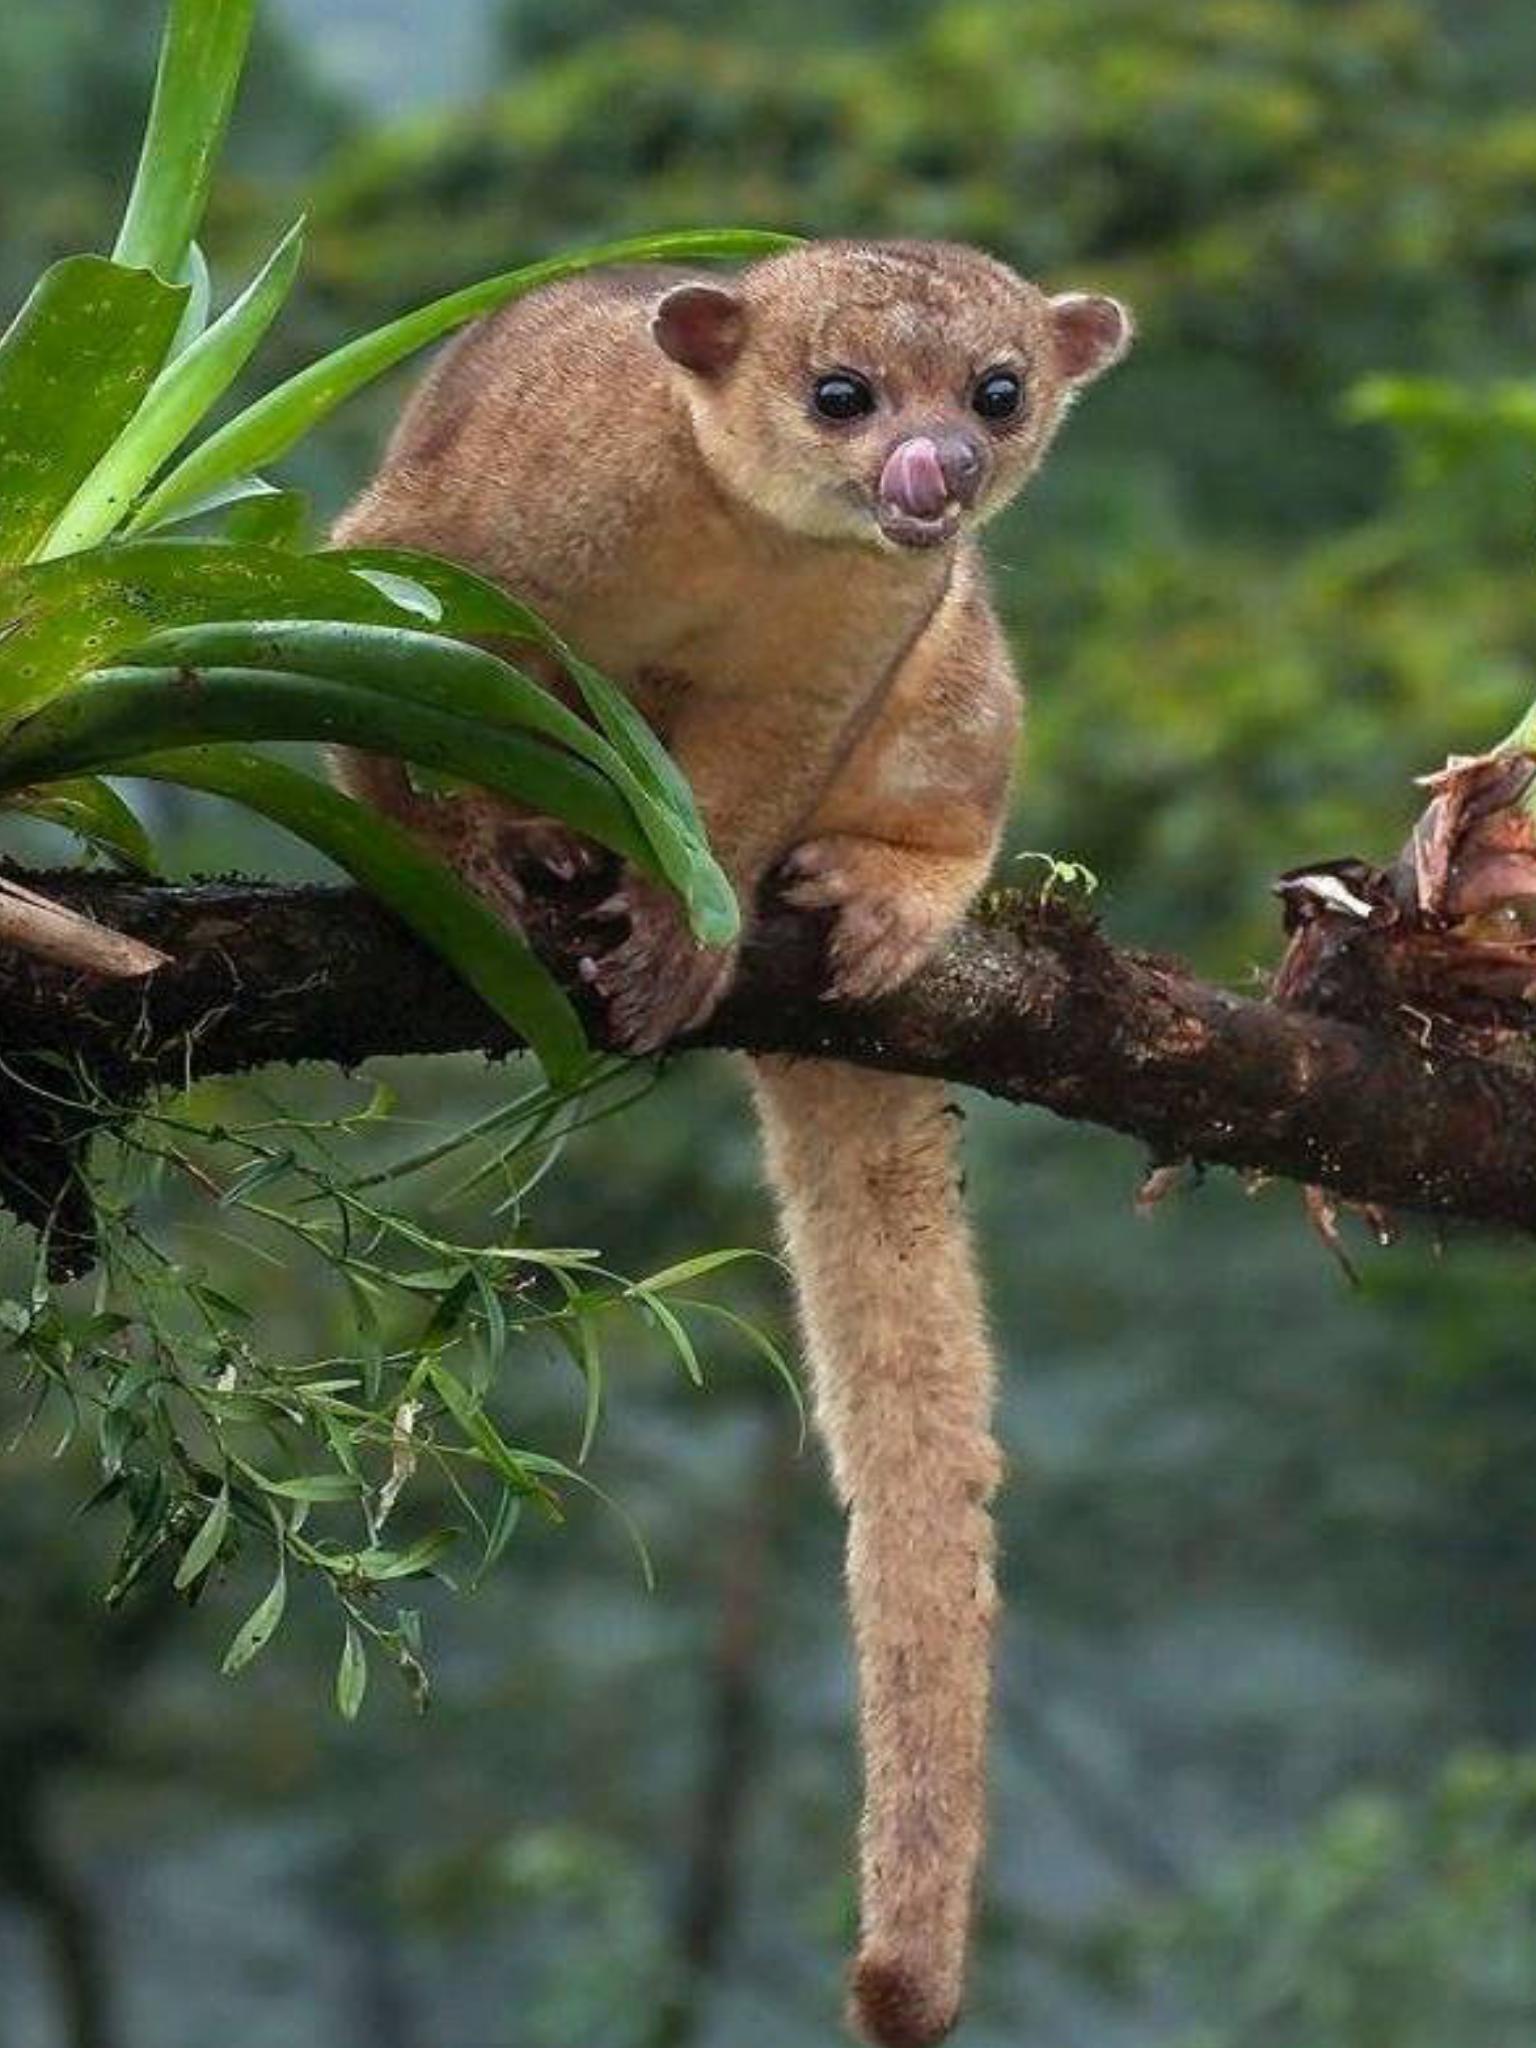 endangered species temeprate rainforest in north america list